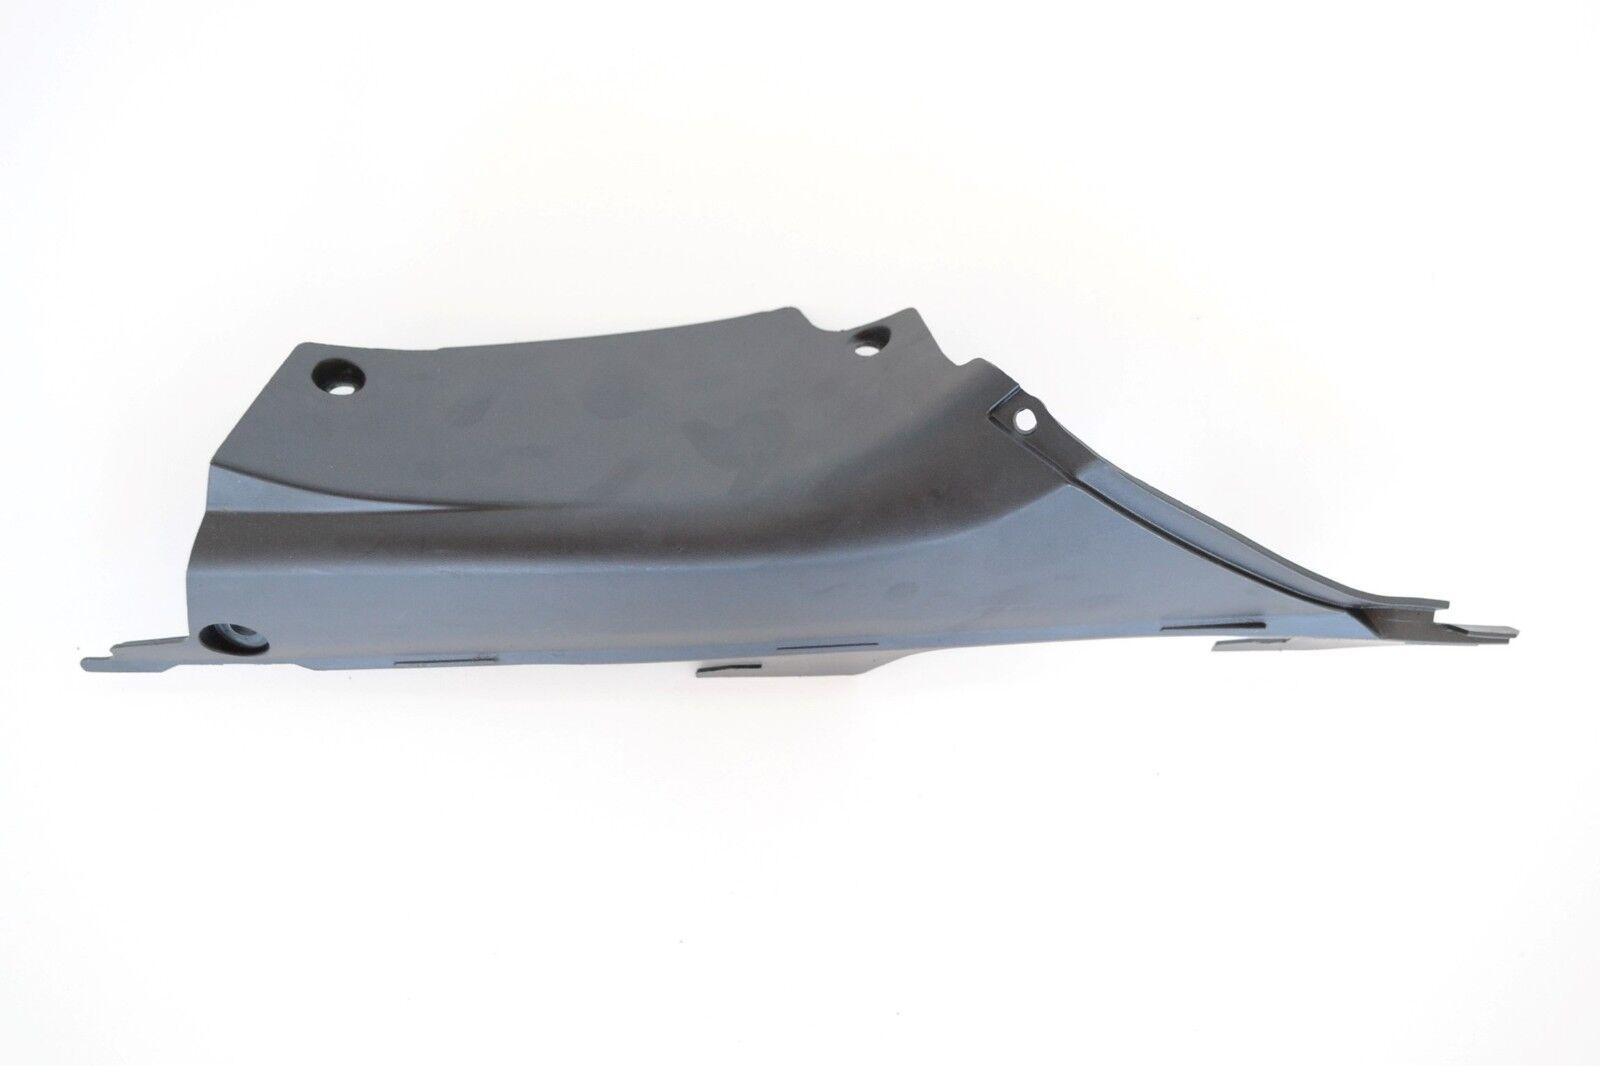 2014 Honda CBR 1000RR Fireblade Linke Seite Luftansaugkanal Abdeckung 64240 MGP